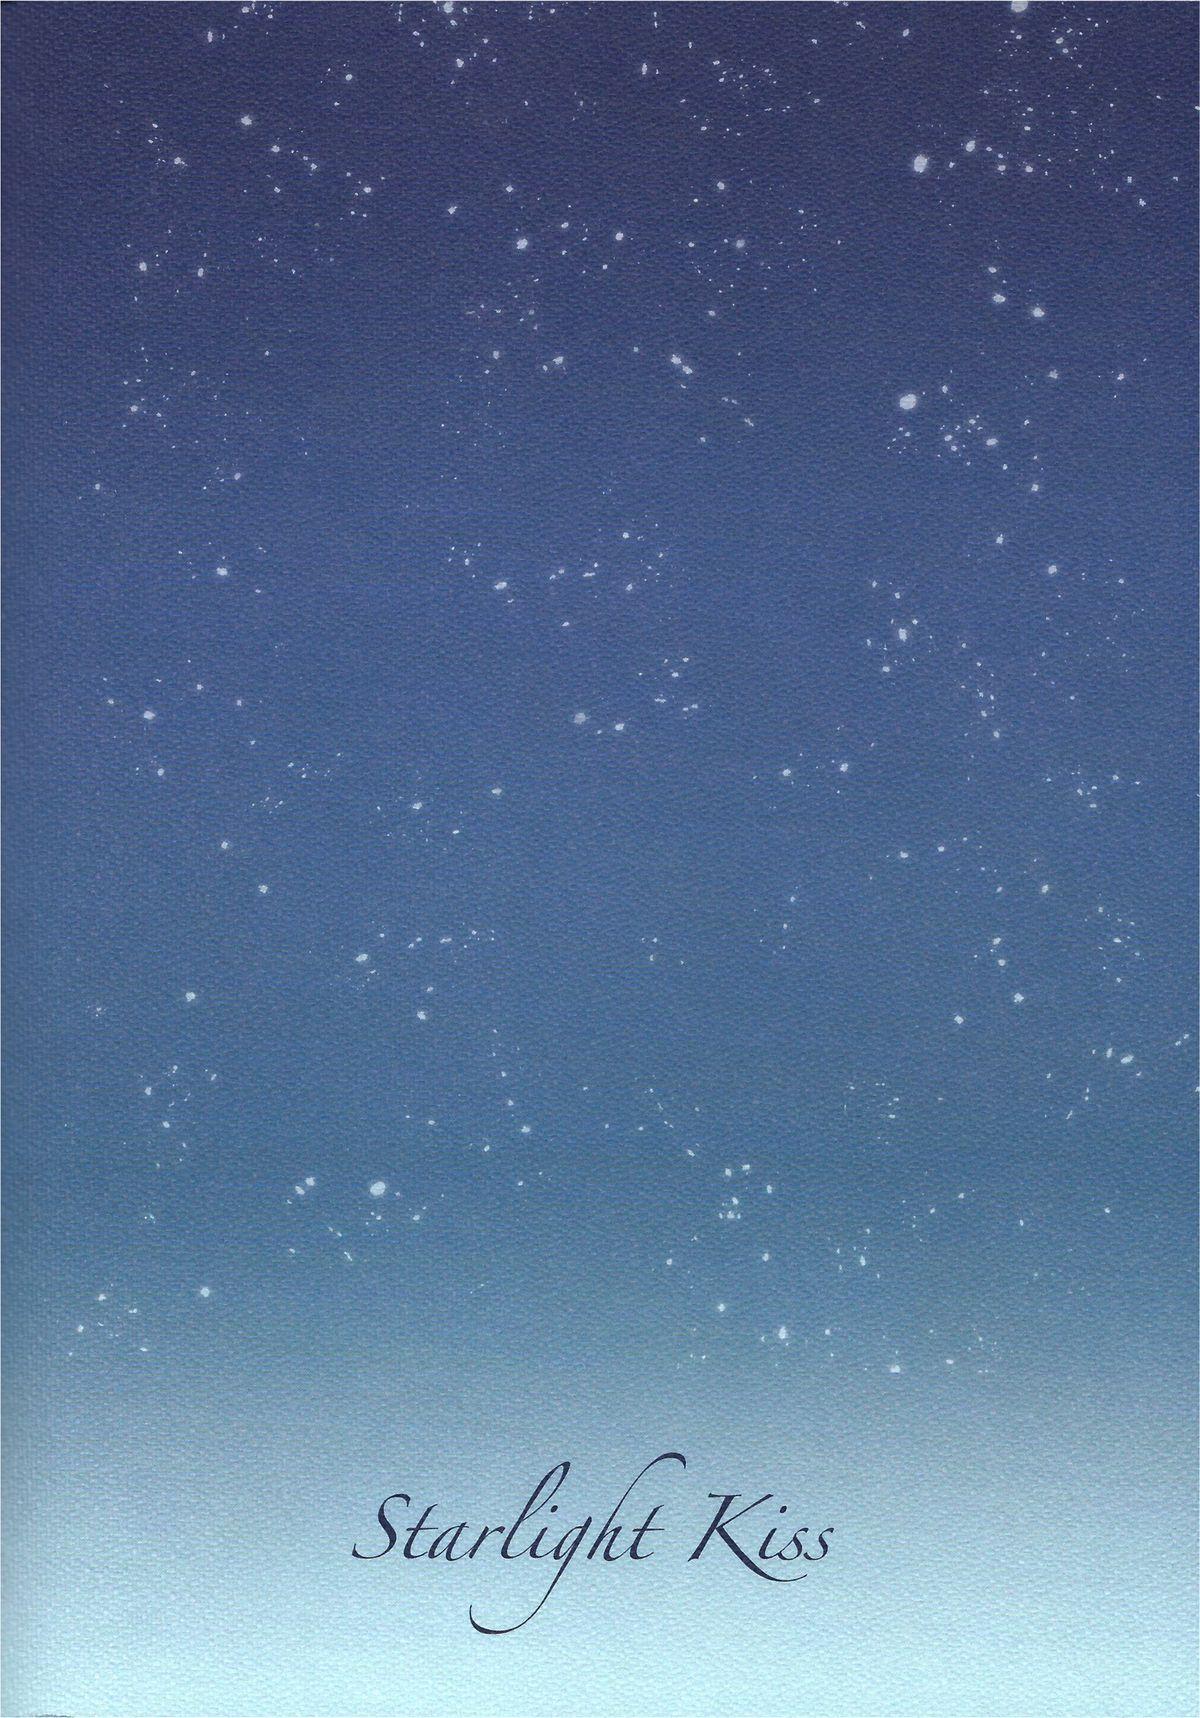 Starlight Kiss 28